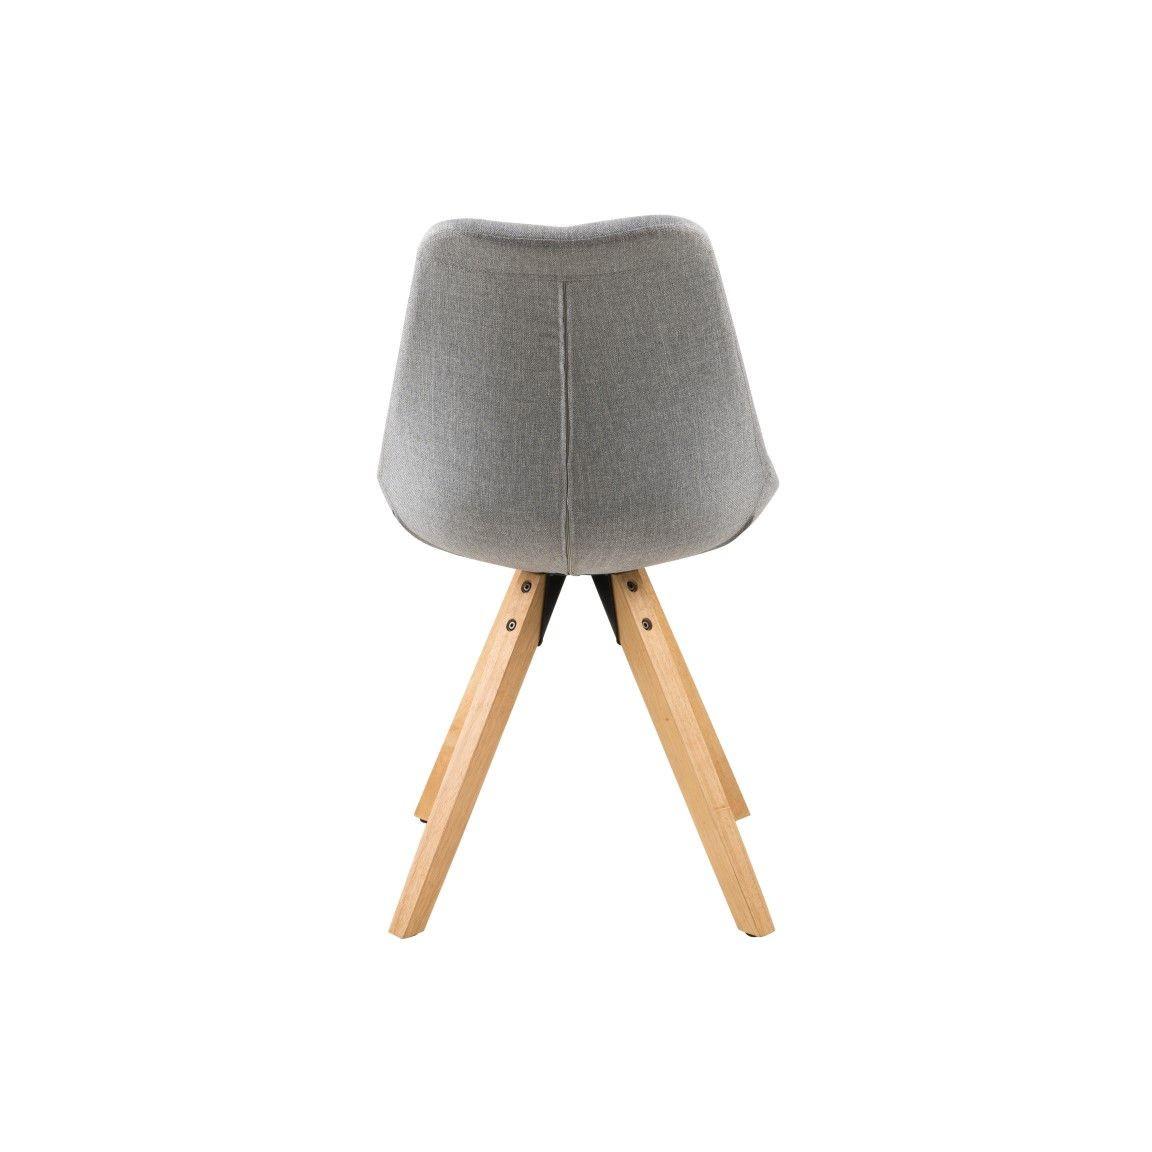 Set of 2 Chairs Nida | Grey & Wood